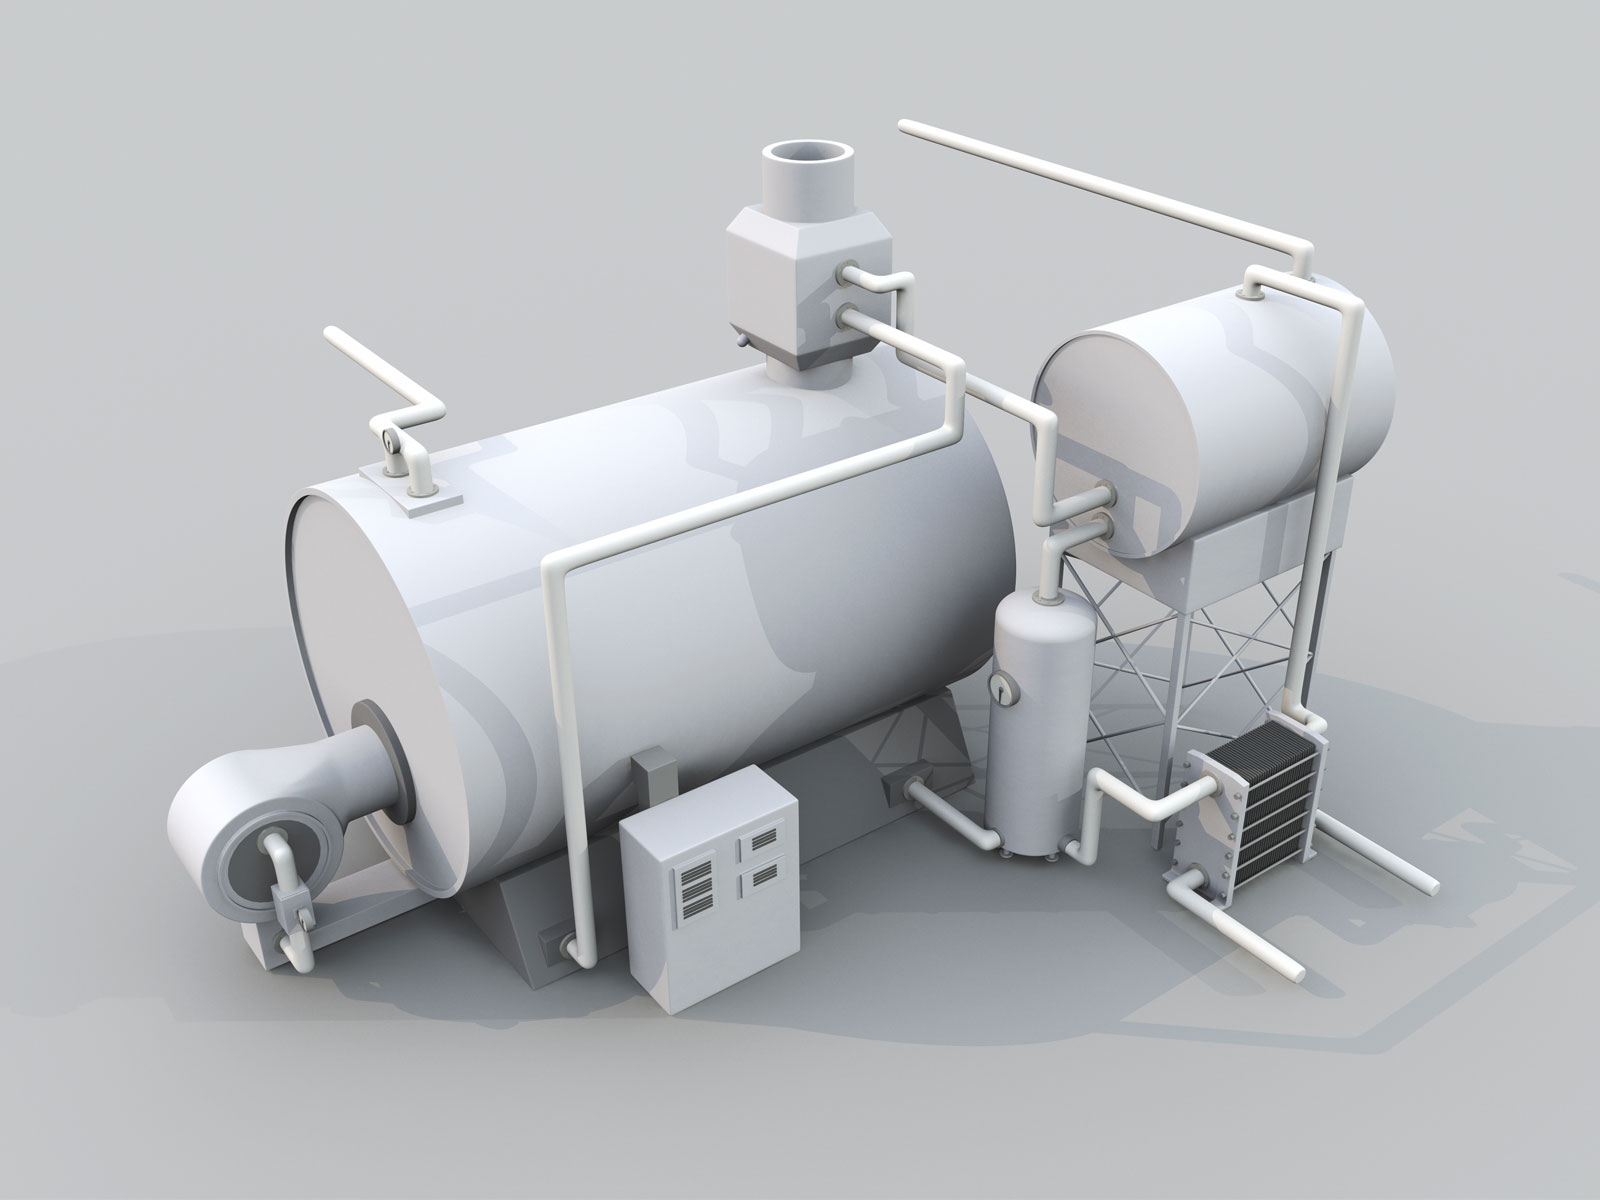 3D Technical Model of Boiler closeup detail